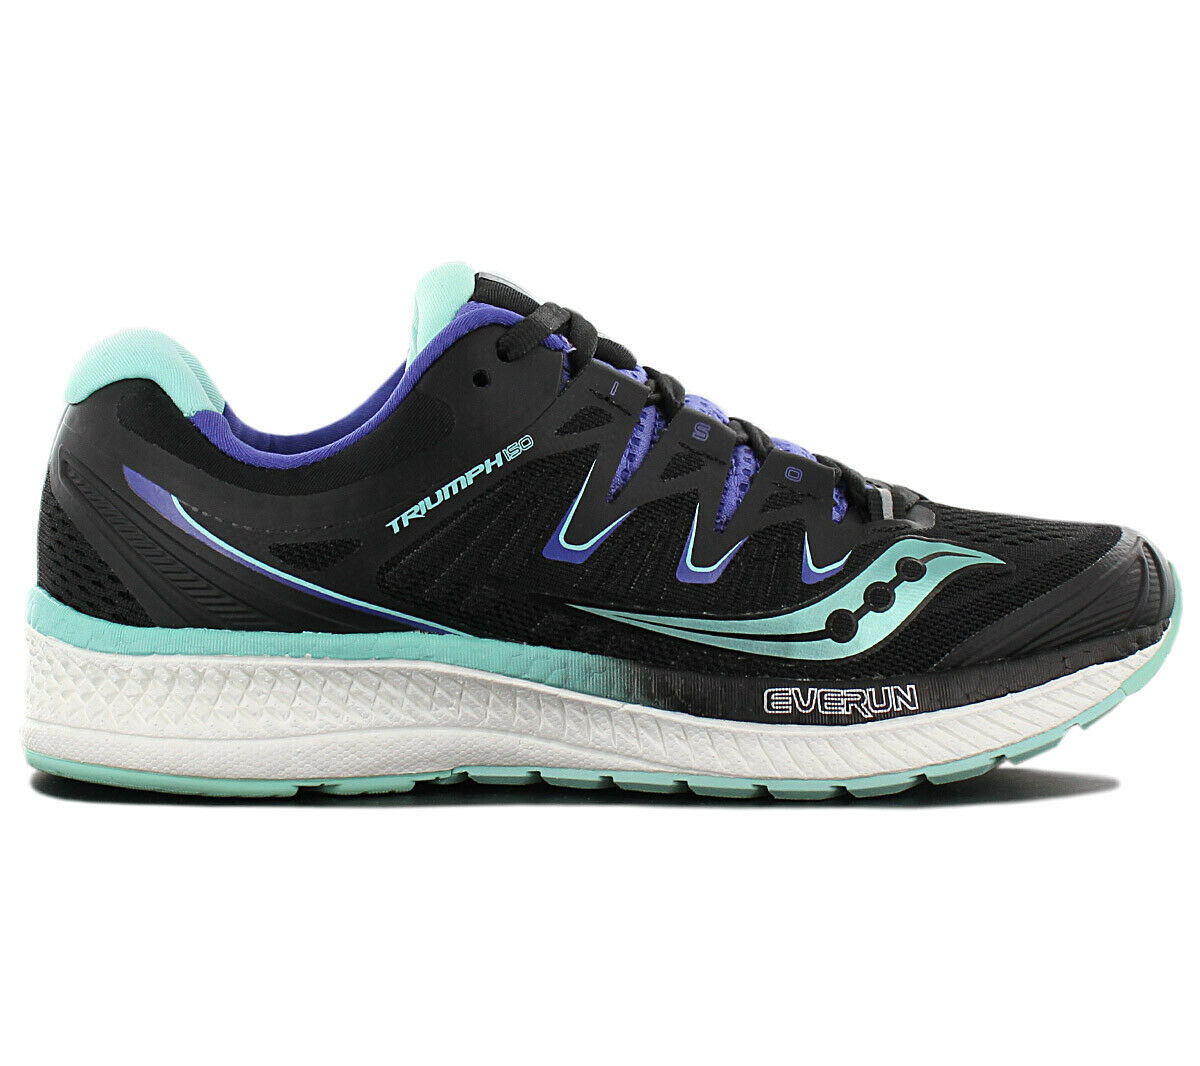 Saucony Triumph ISO 4 Damen Laufschuhe Schwarz S10413-4 Running Jogging Schuhe